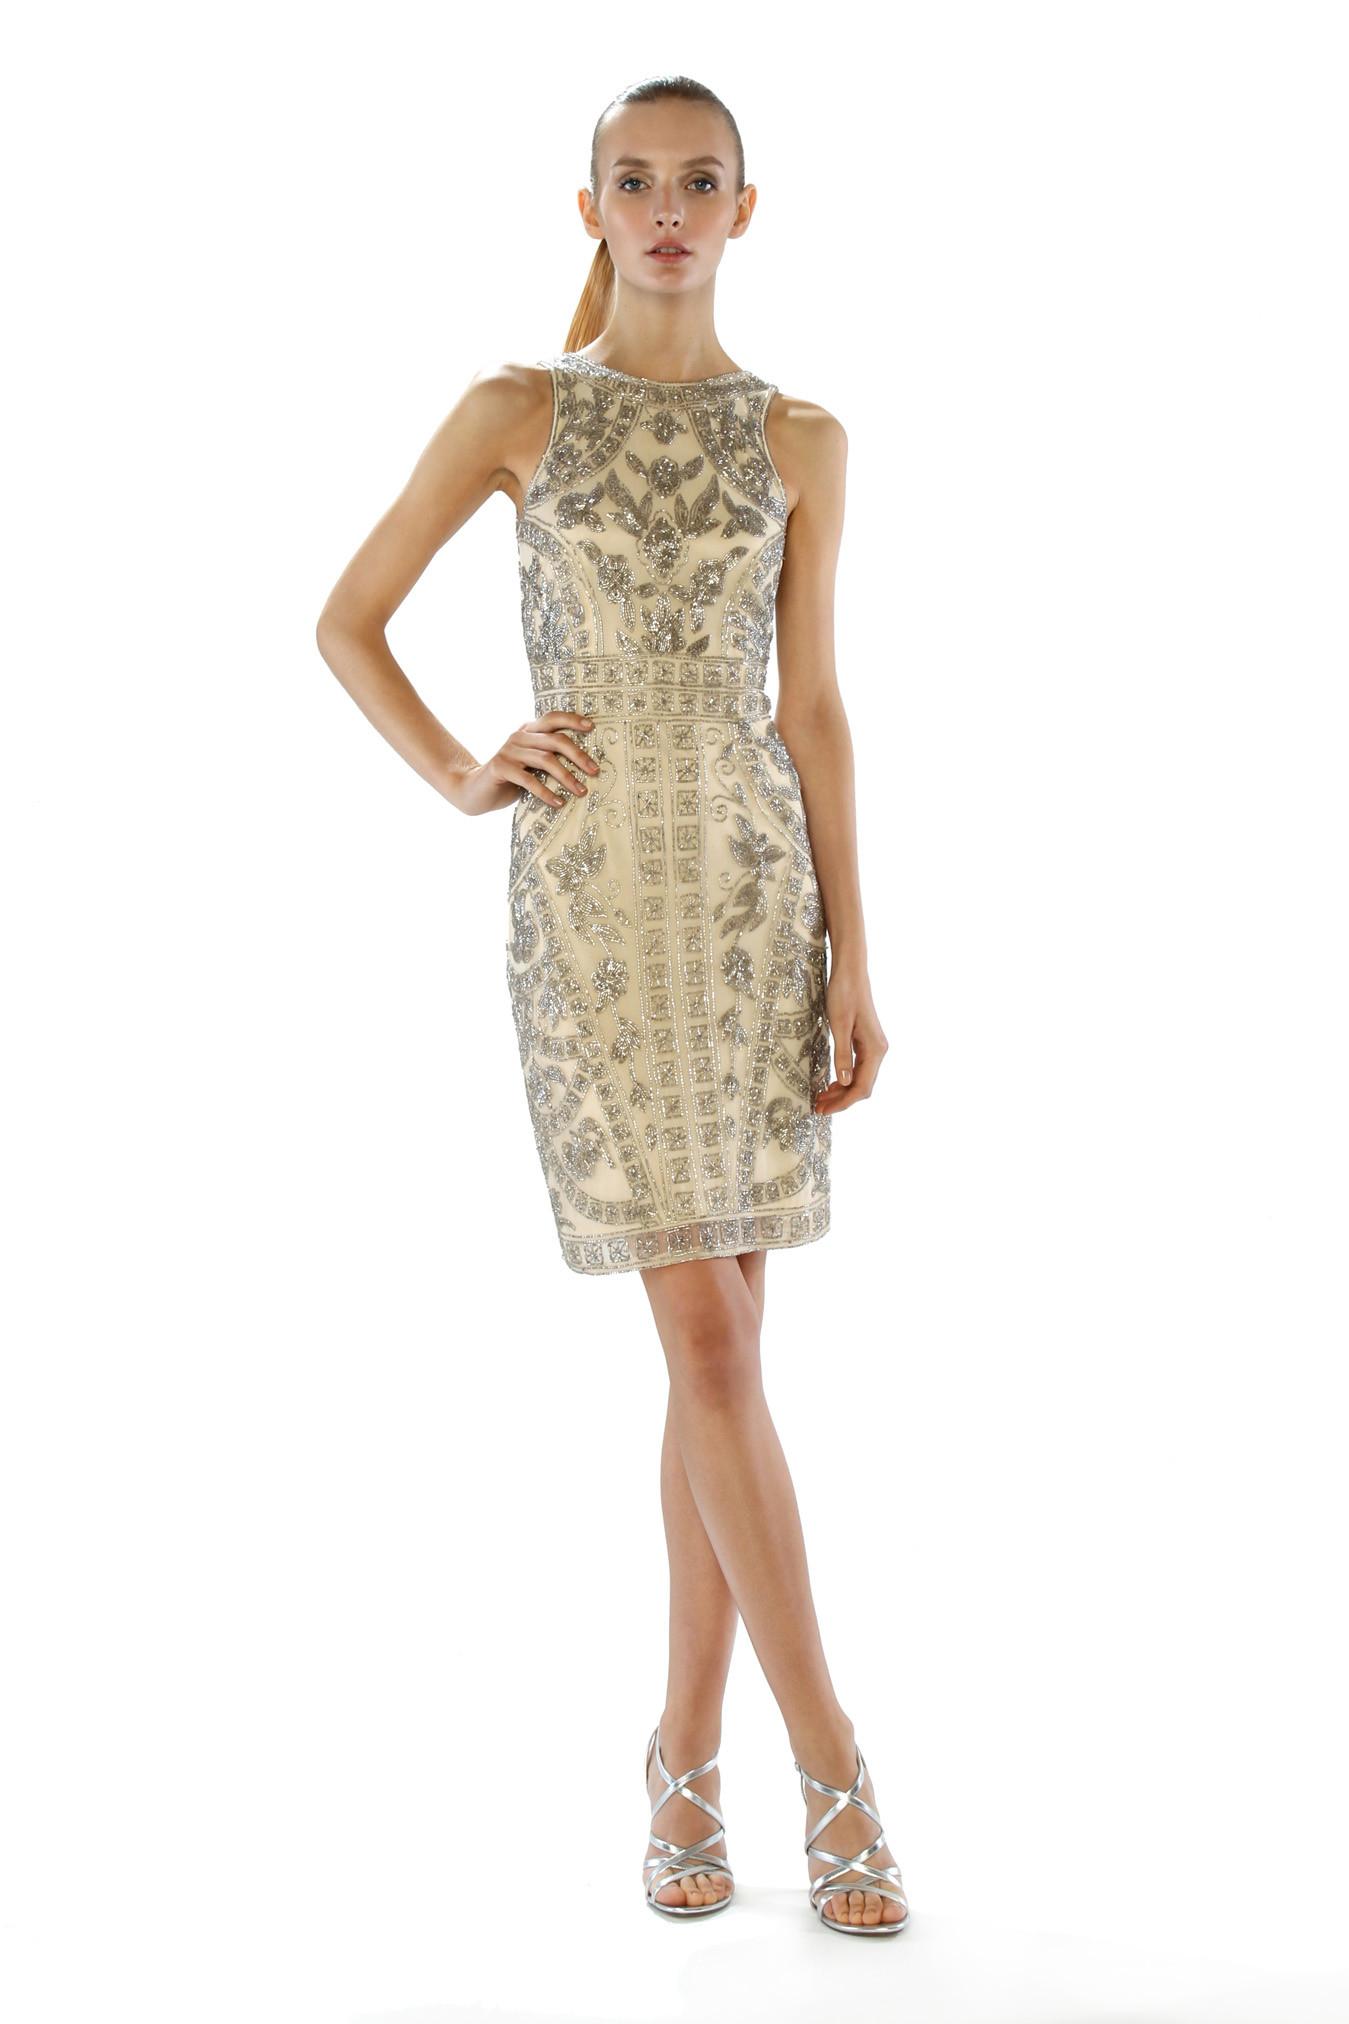 Lyst - Theia Beaded Jewel Neck Cocktail Dress in Metallic